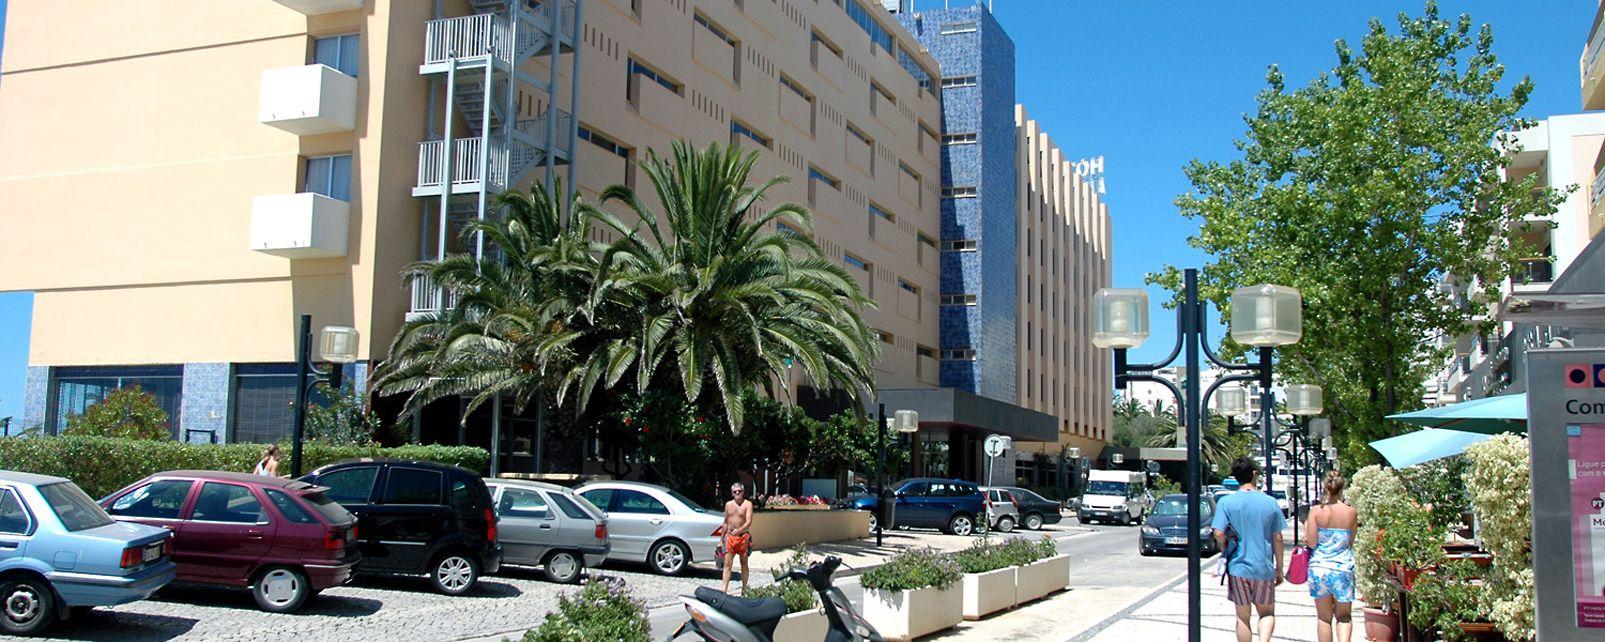 Algarve casino portimao